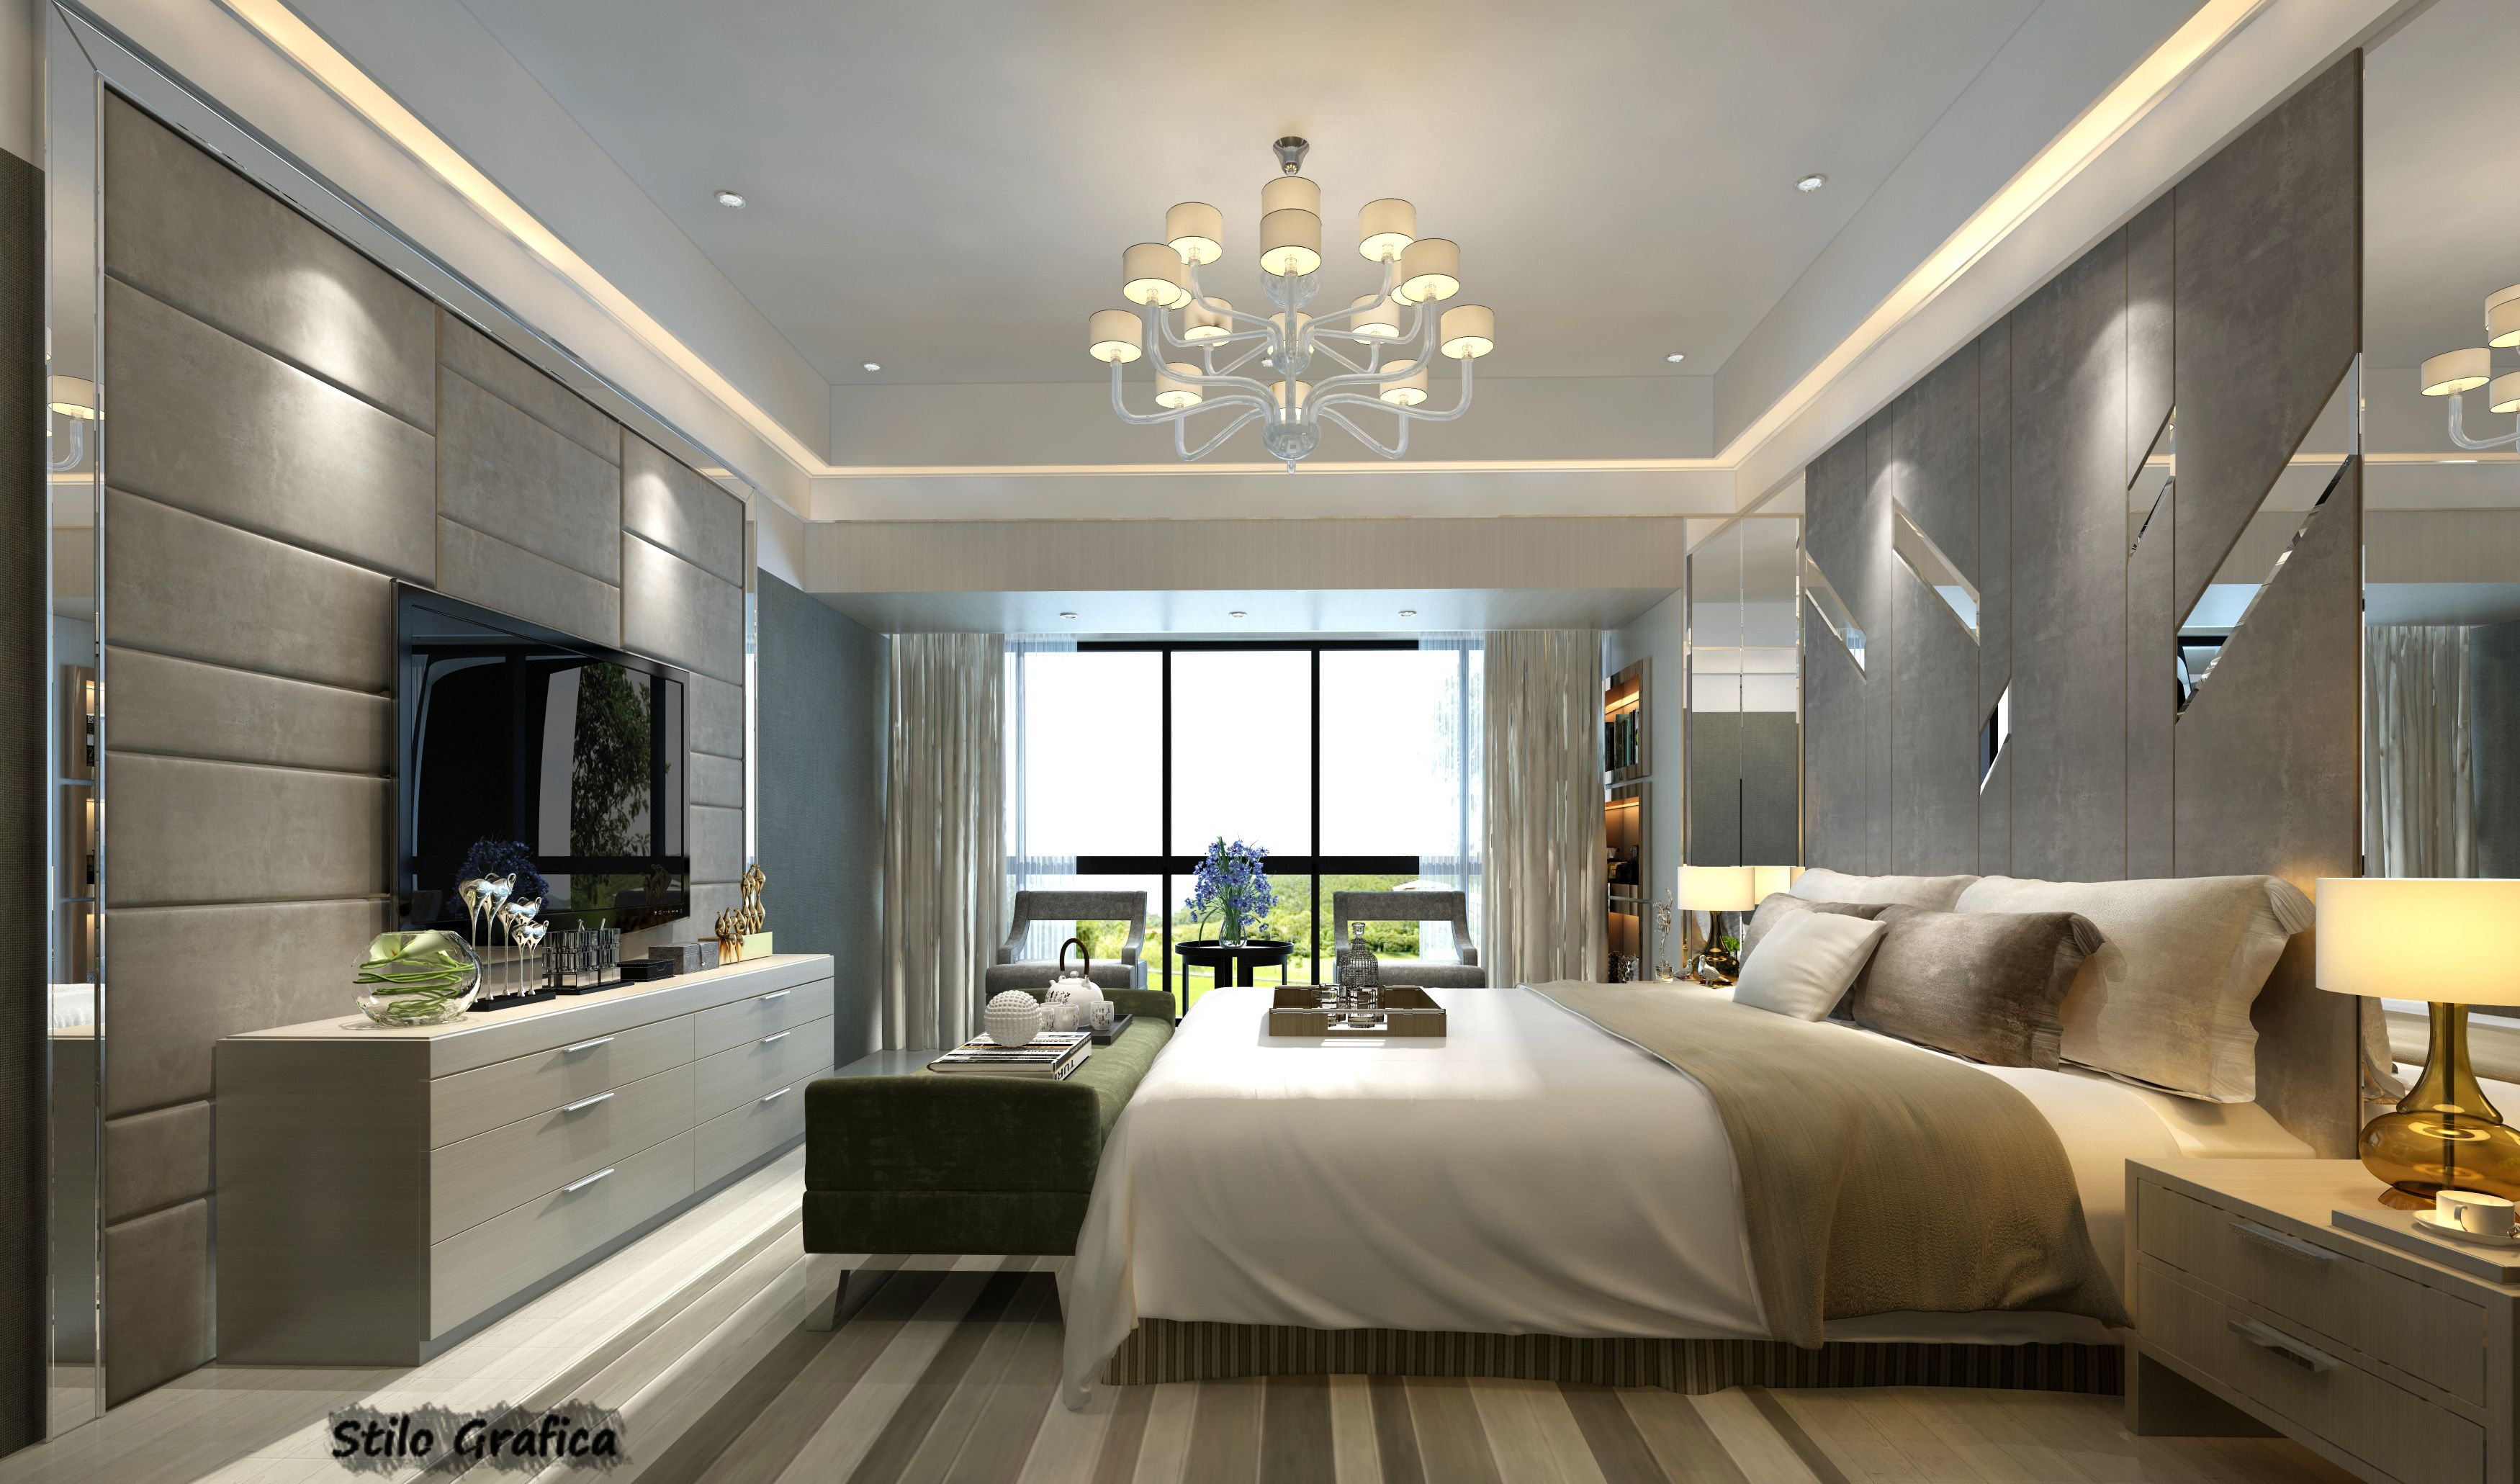 Bedroom Interior Design Bedroom Interior home design bedroom